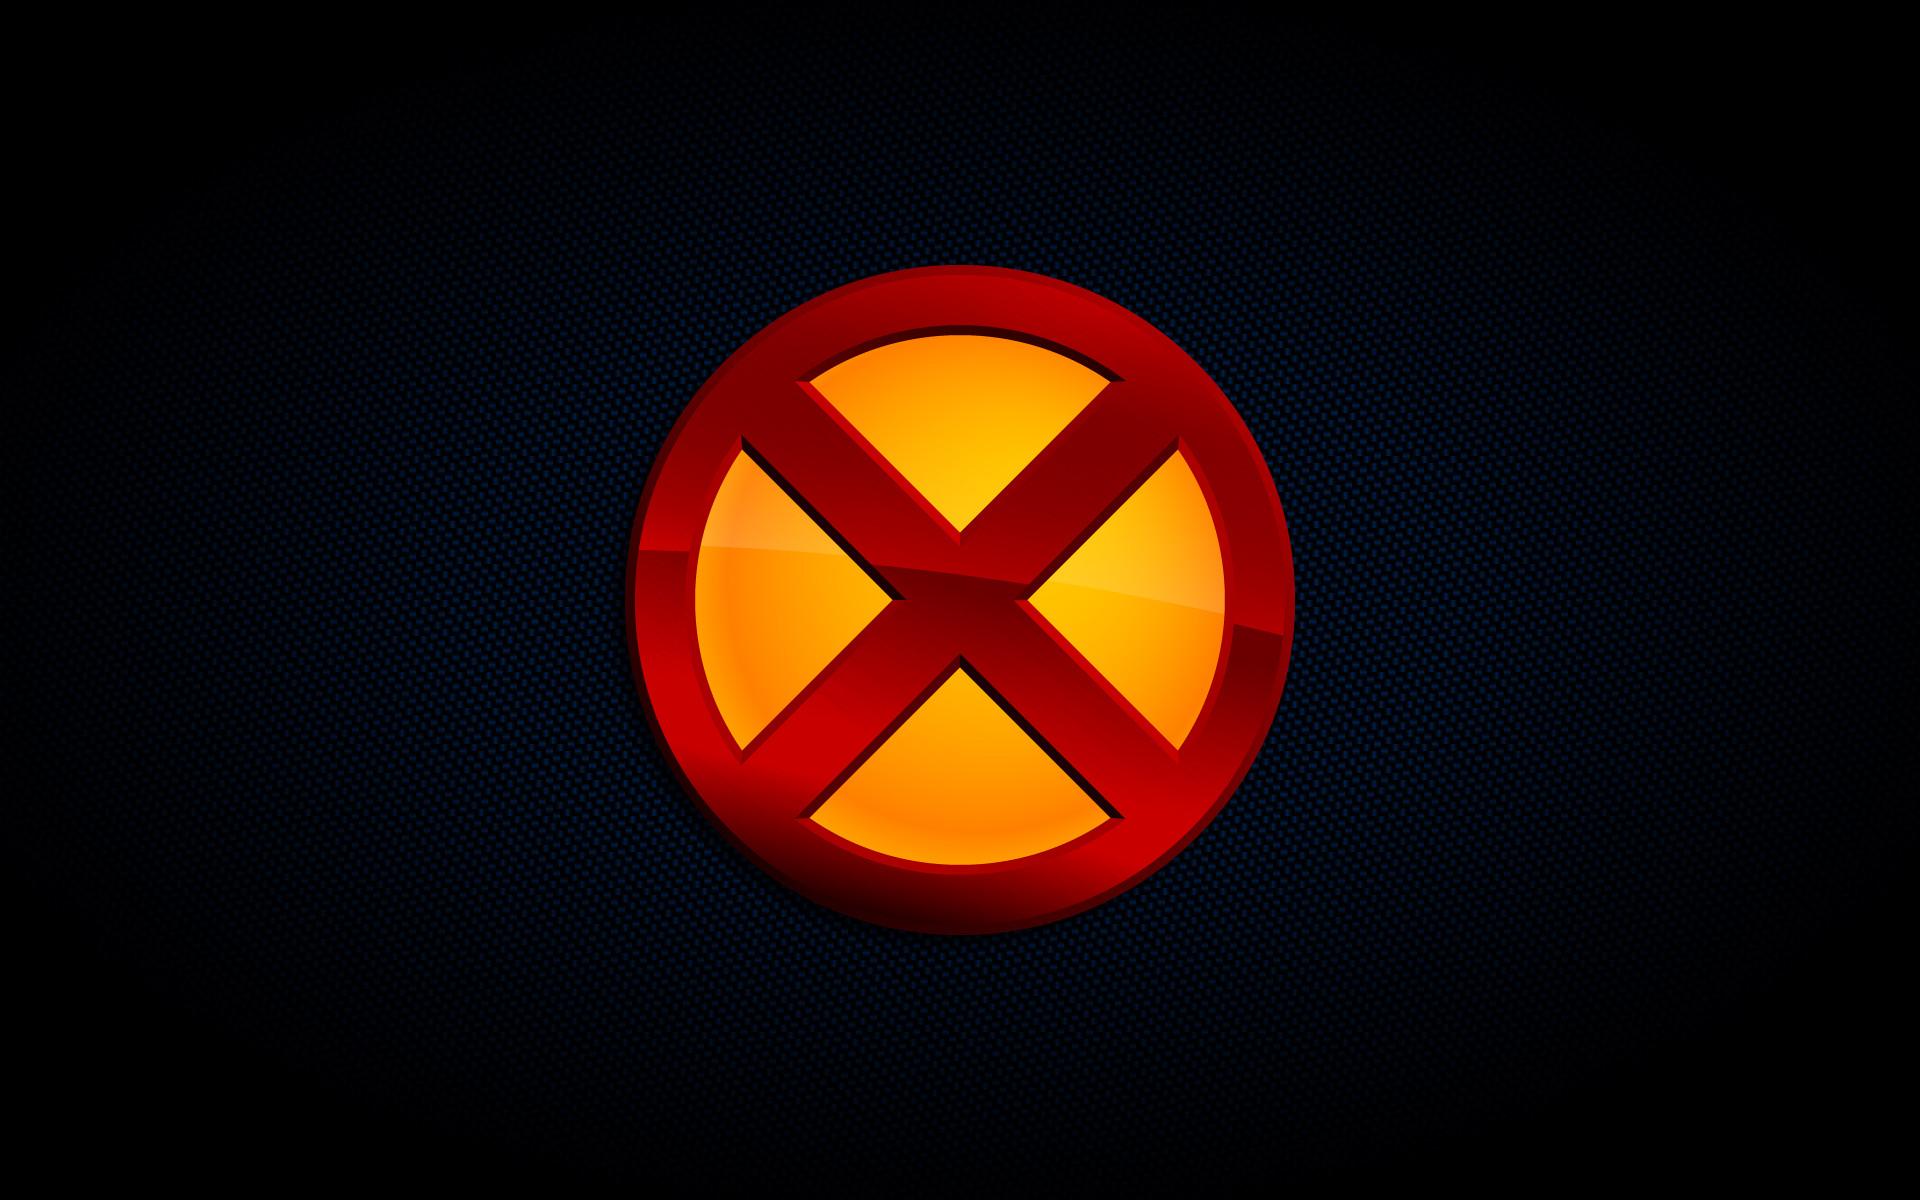 X-Men Logos wallpaper